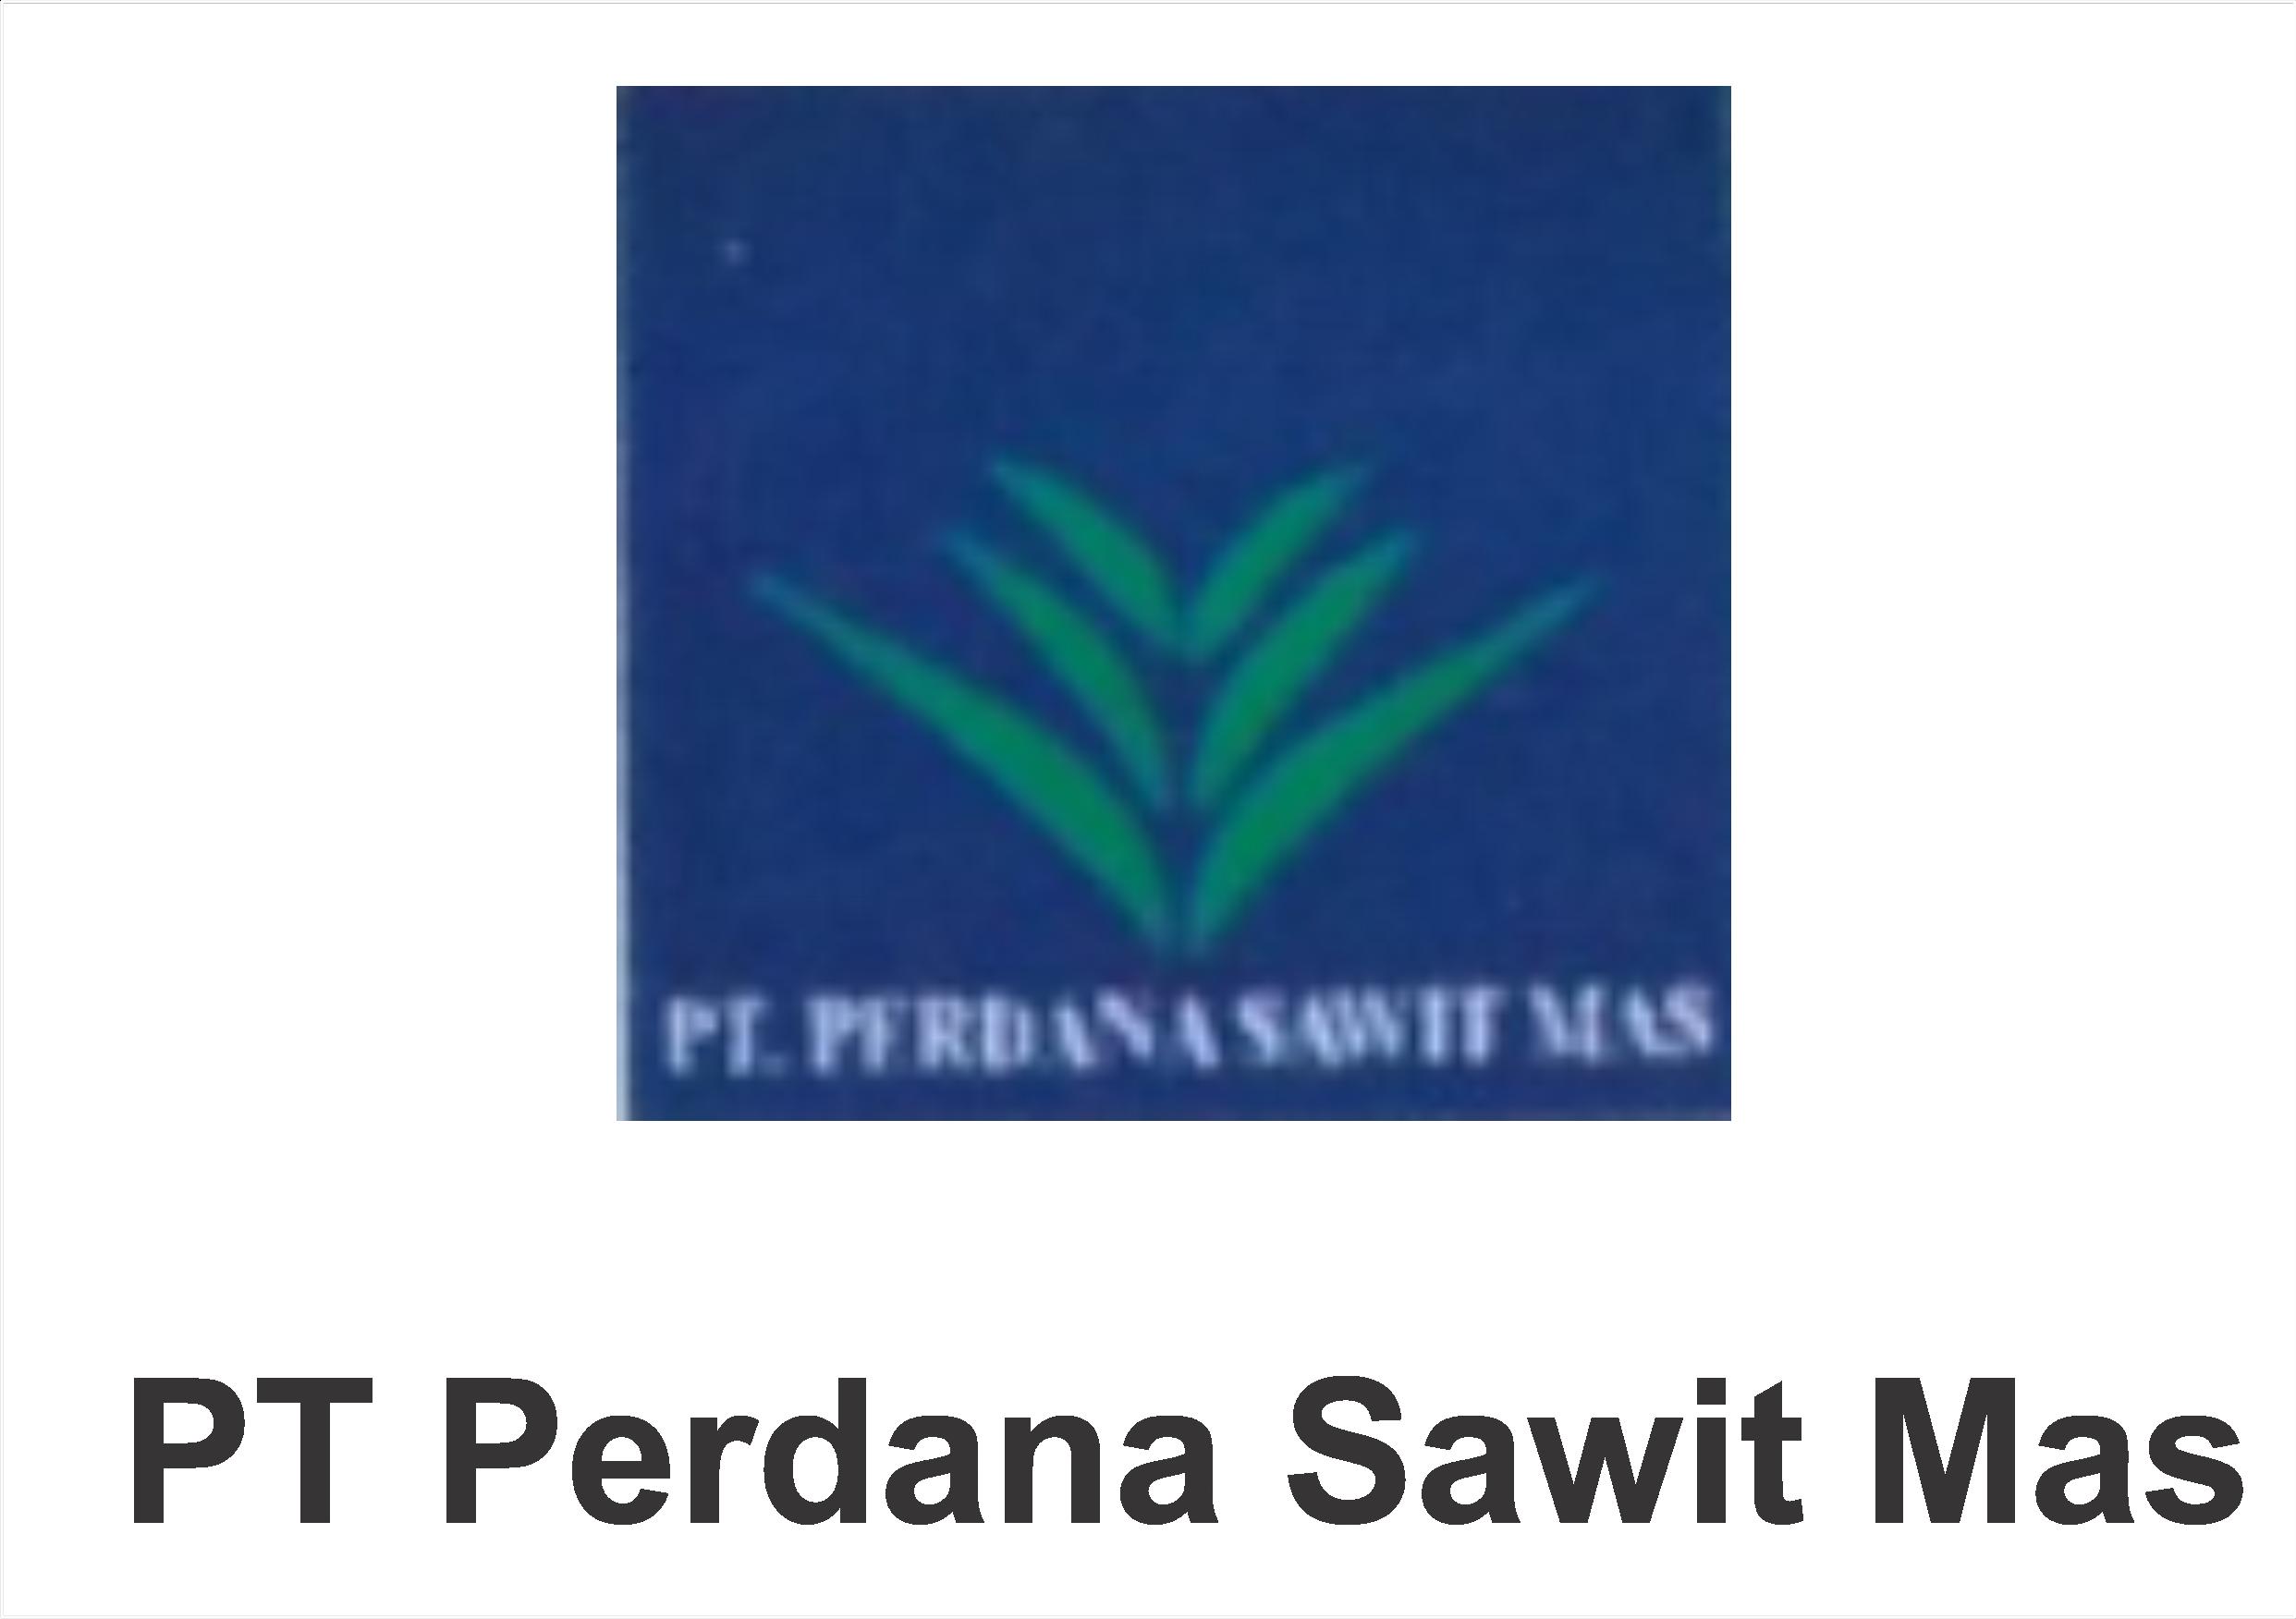 PT Perdana Sawit Mas